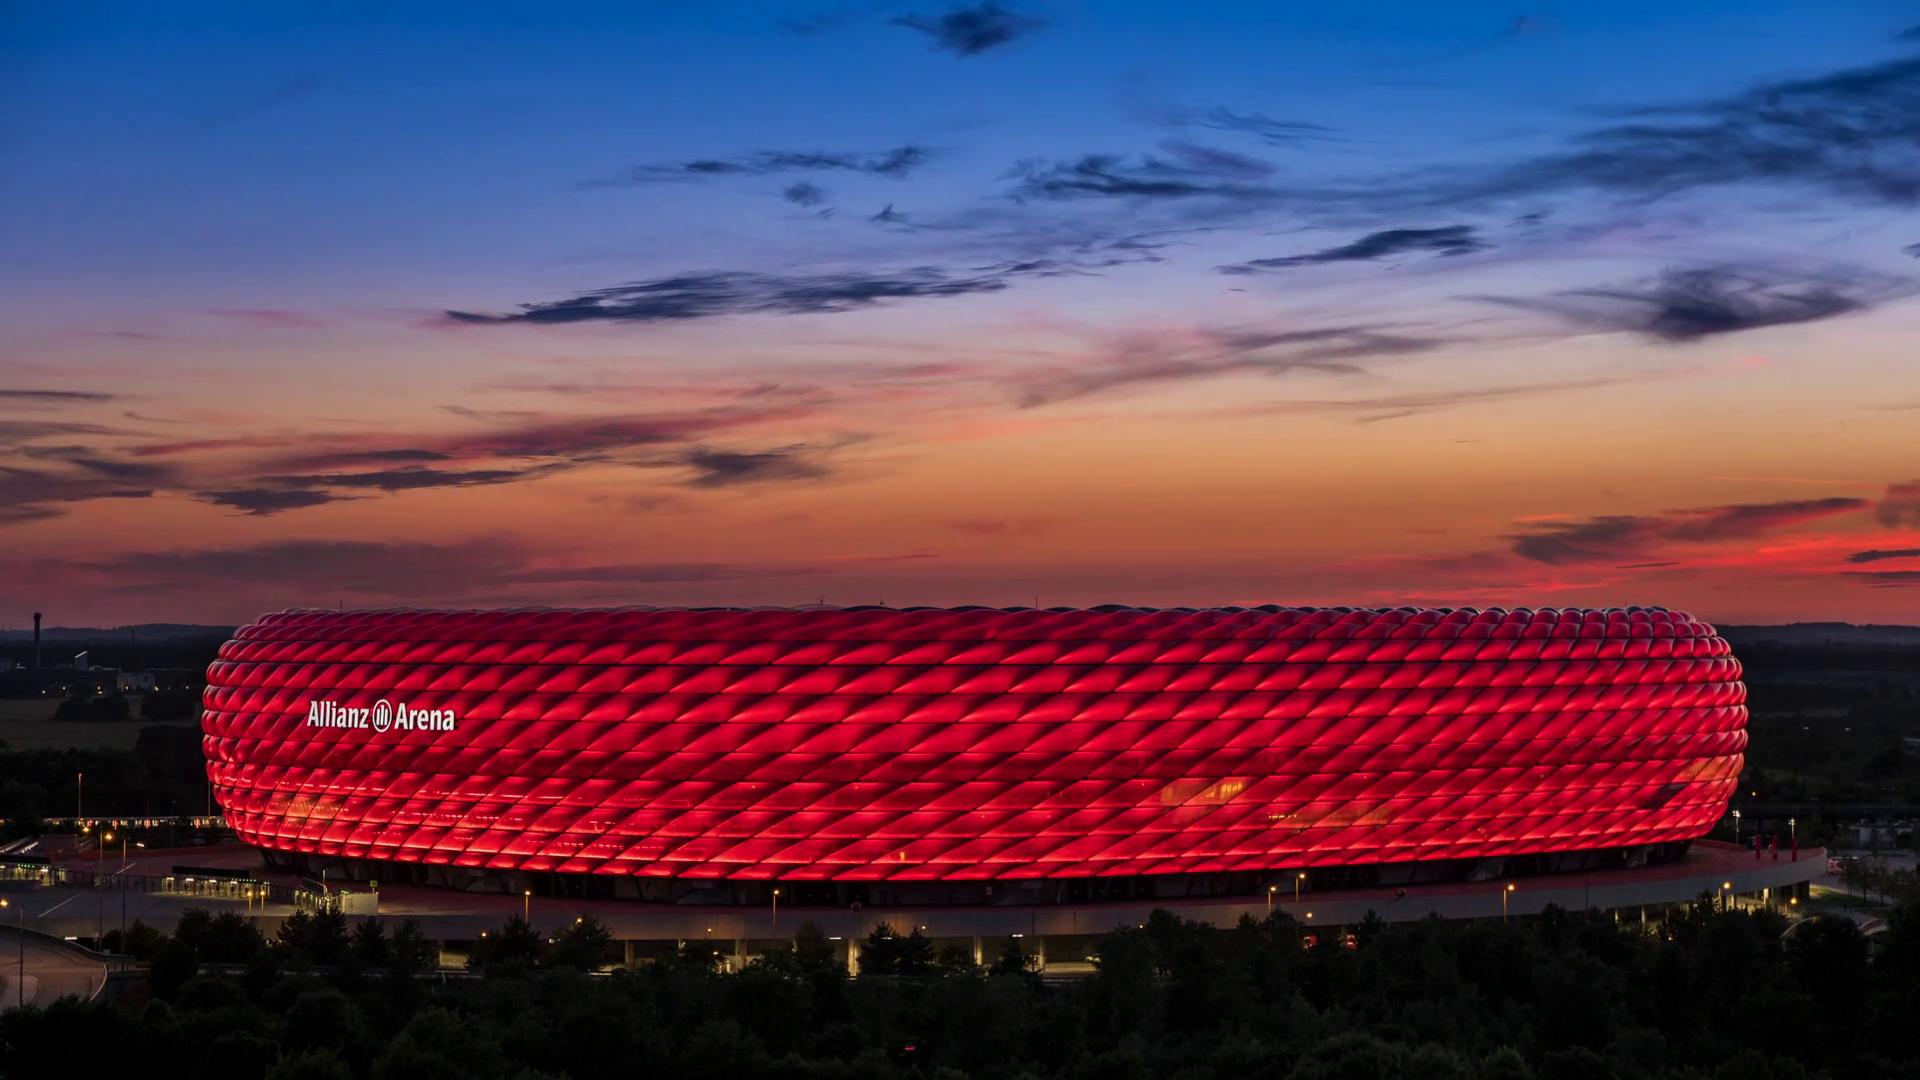 The beautiful Allianz Arena in Munich during evening